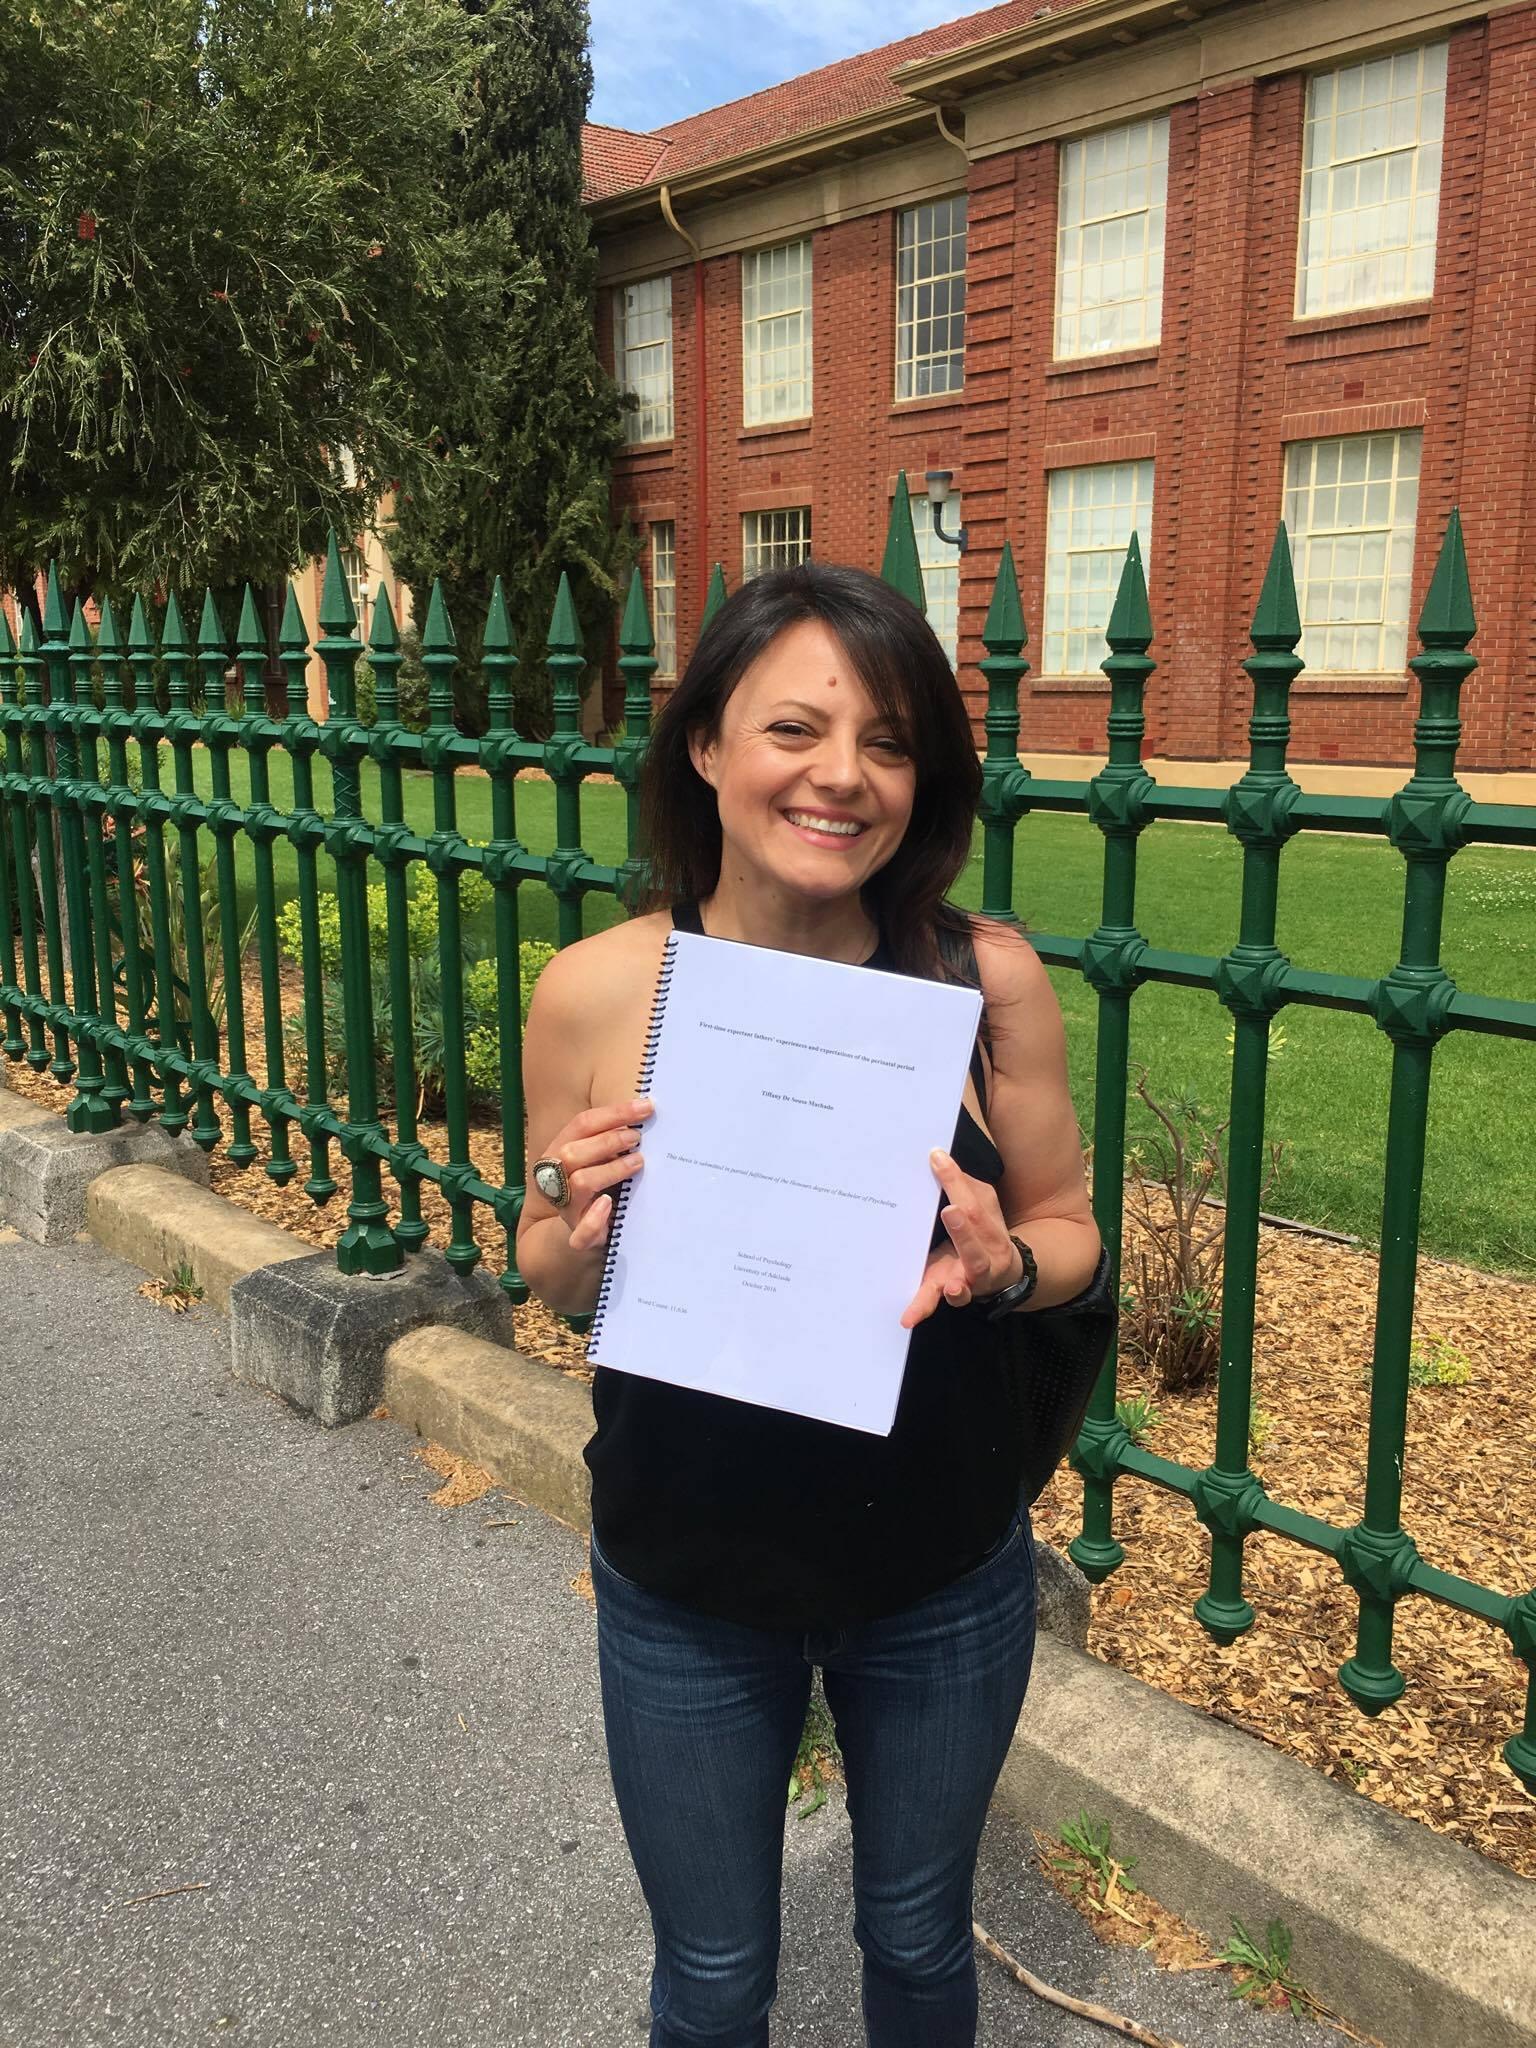 Handing up my Hons thesis - 'Men's perceptions and understandings of postnatal depression'